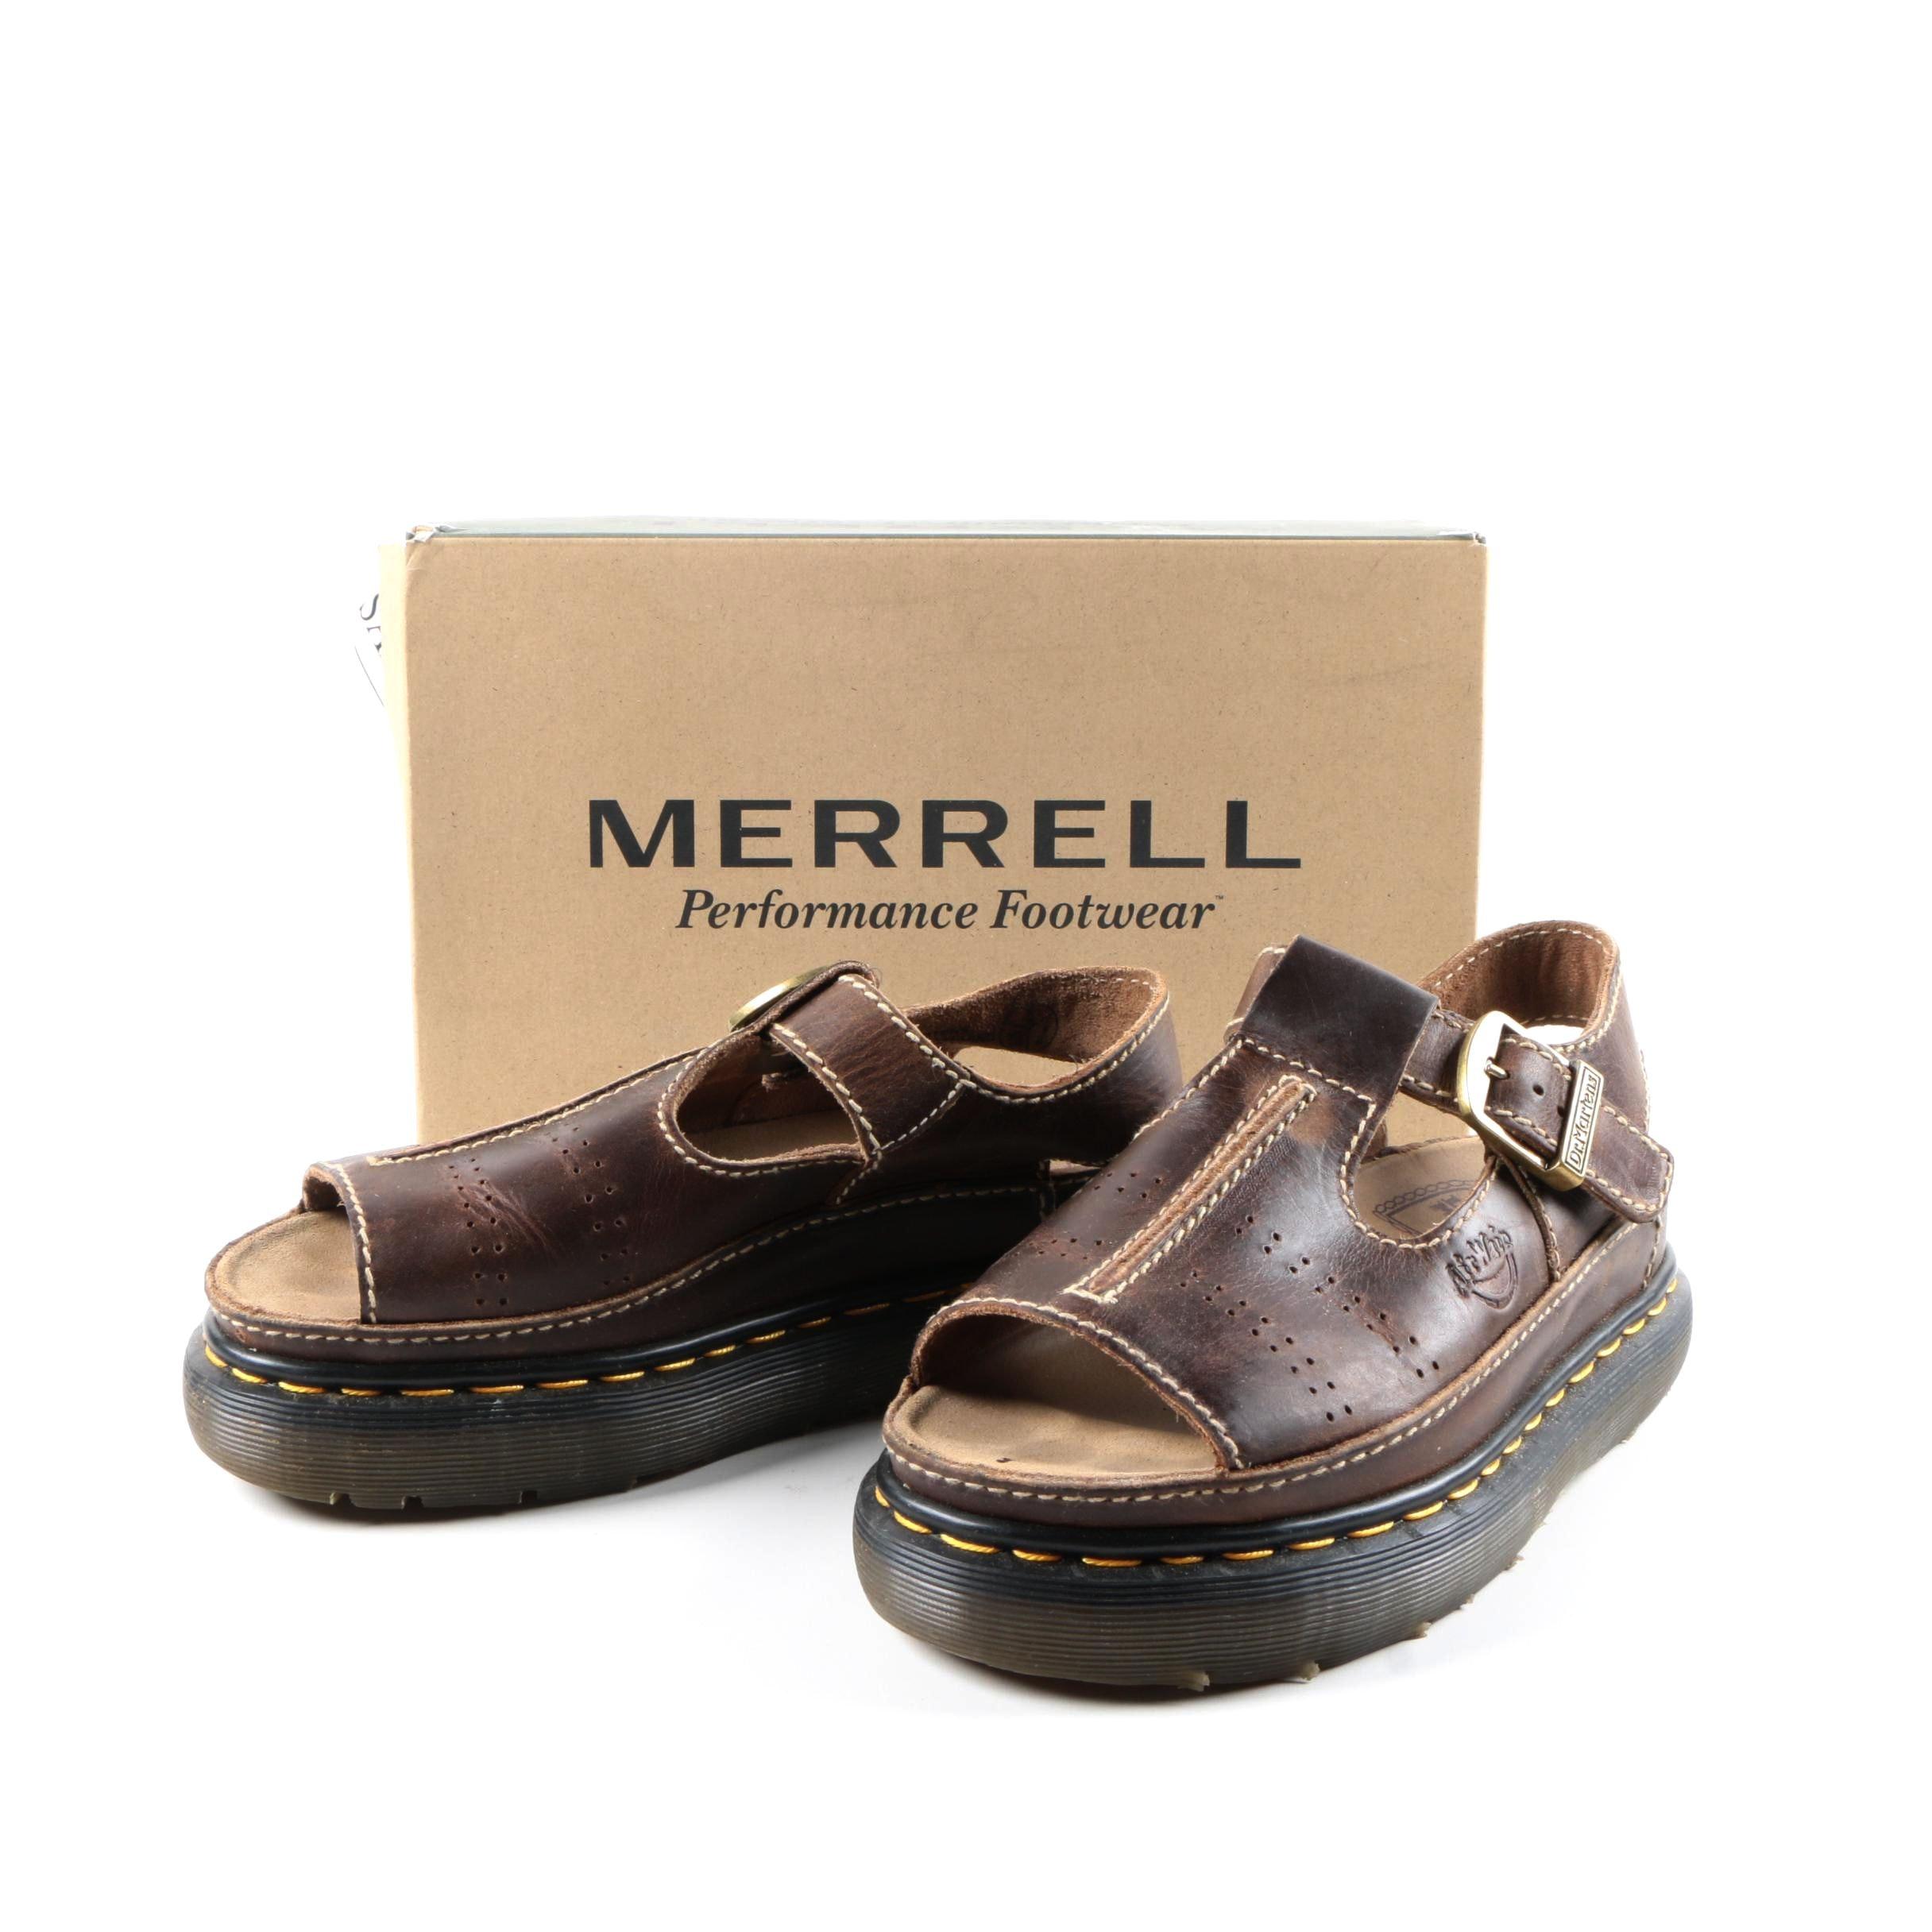 Dr. Martens Women's Leather Sandals